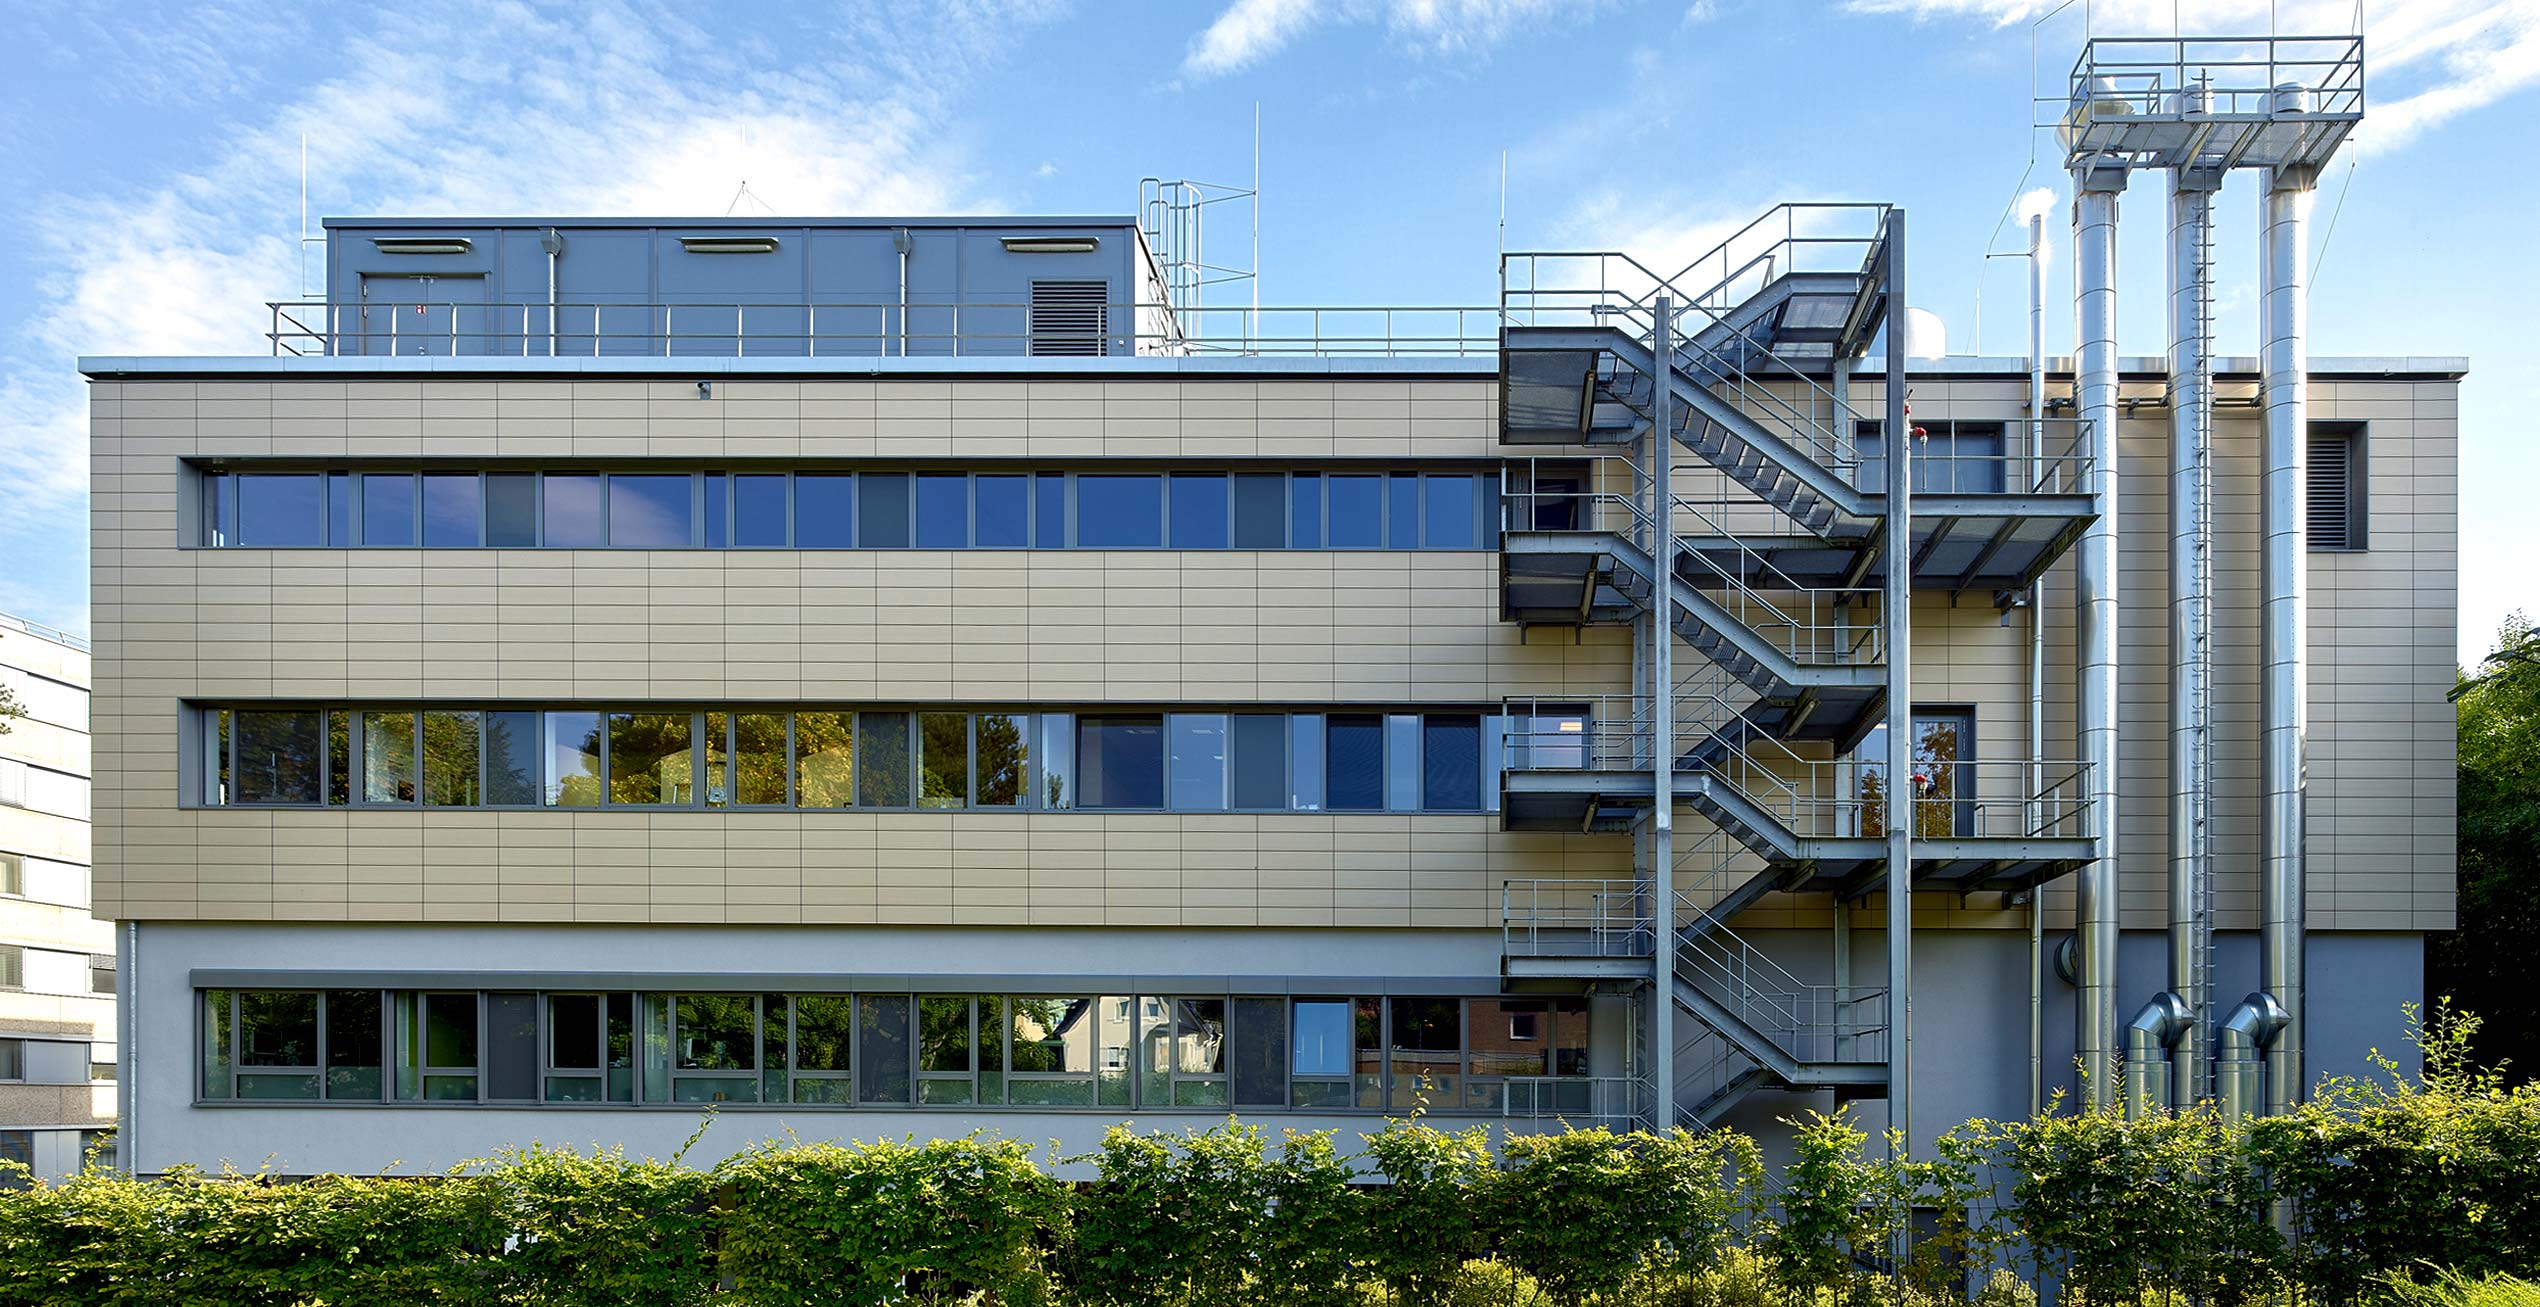 Startbild der Fassade der OP-Abteilung im St. Raphael Hospital in Ostercappeln